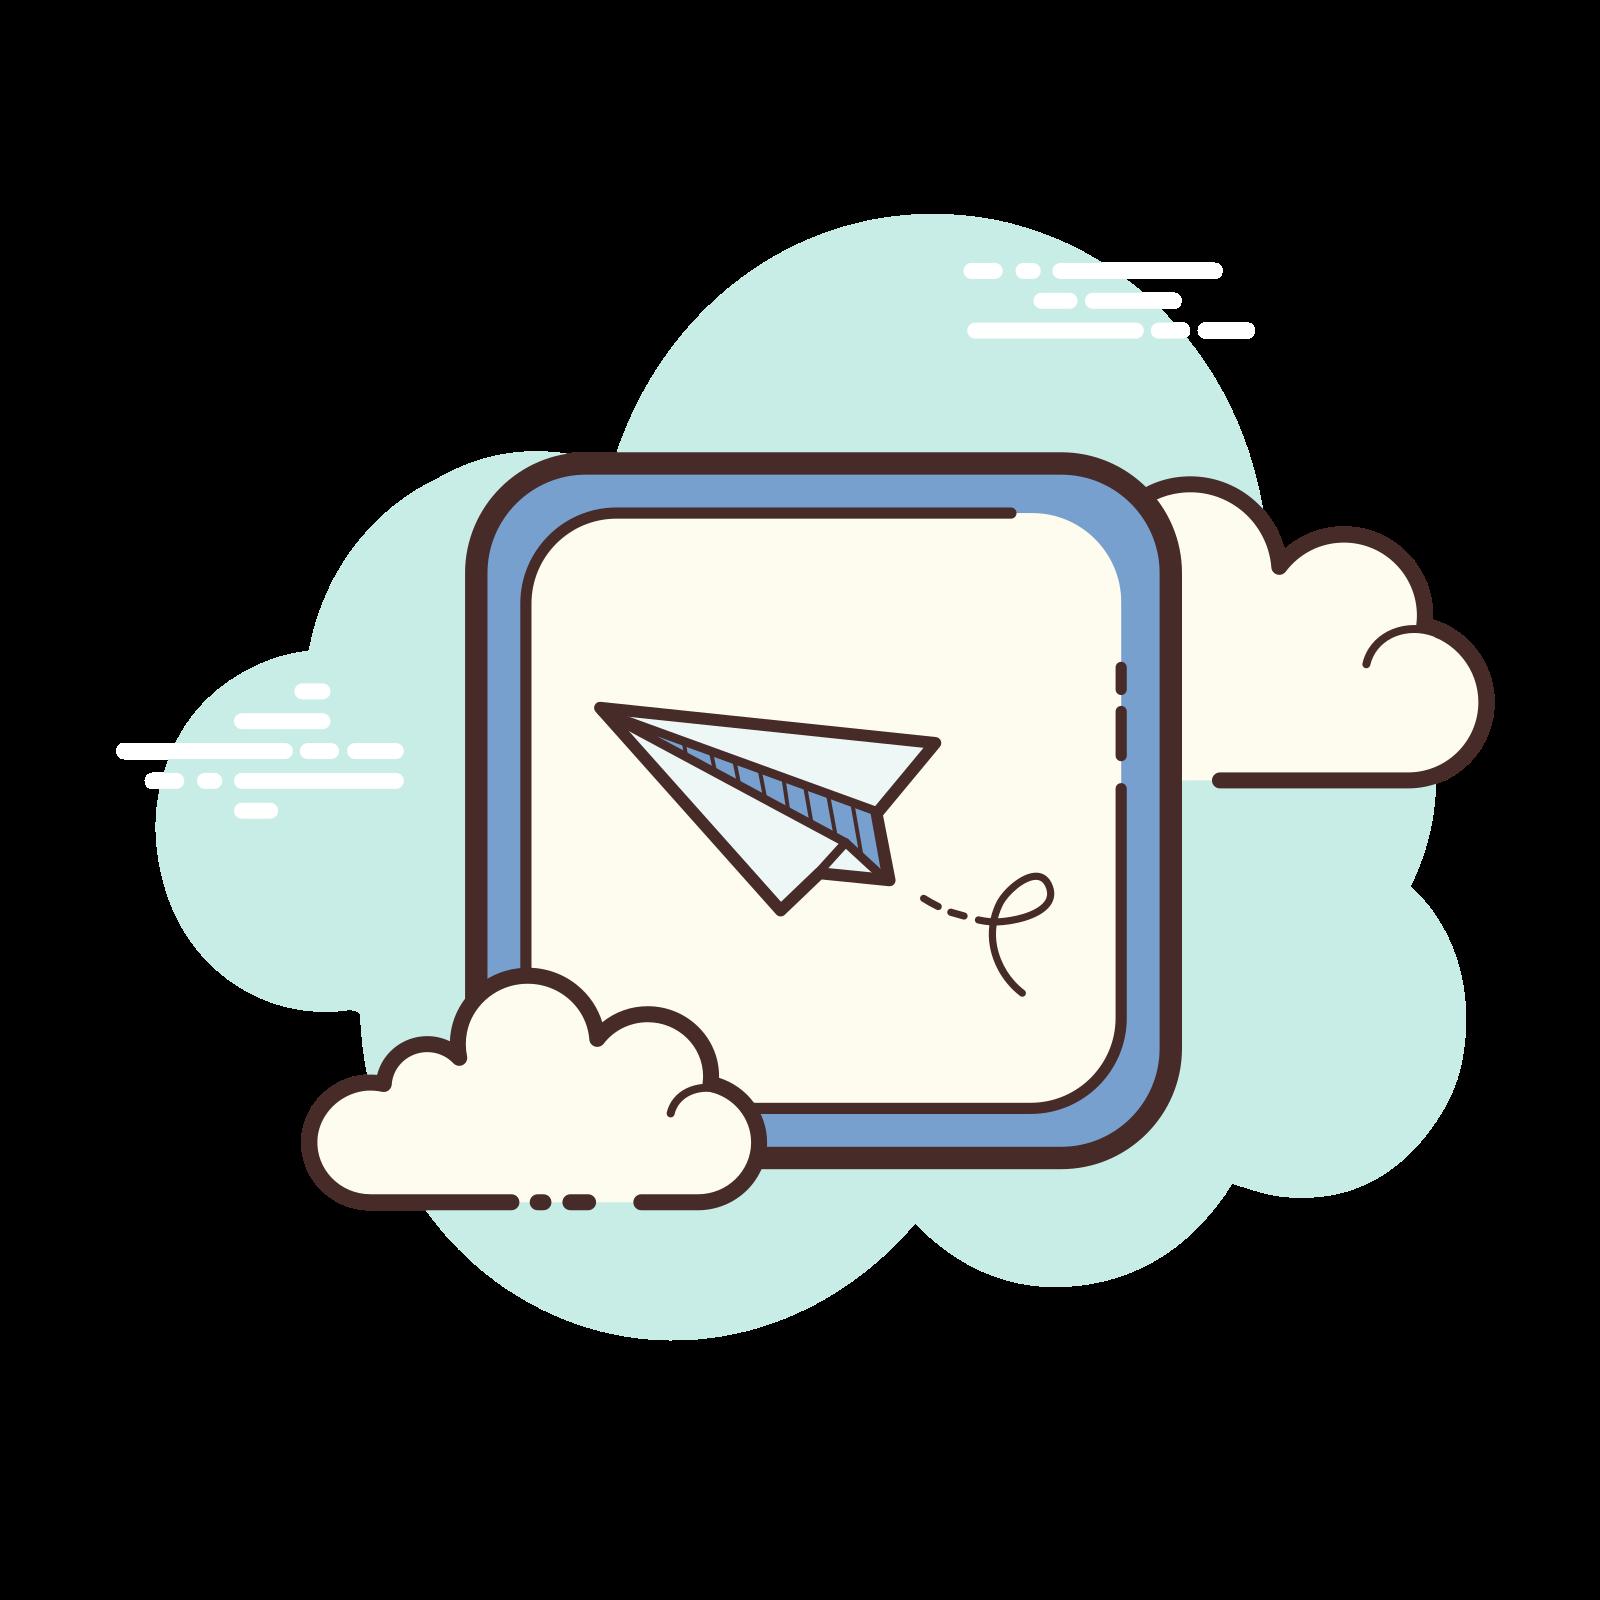 Paper Plane Message icon